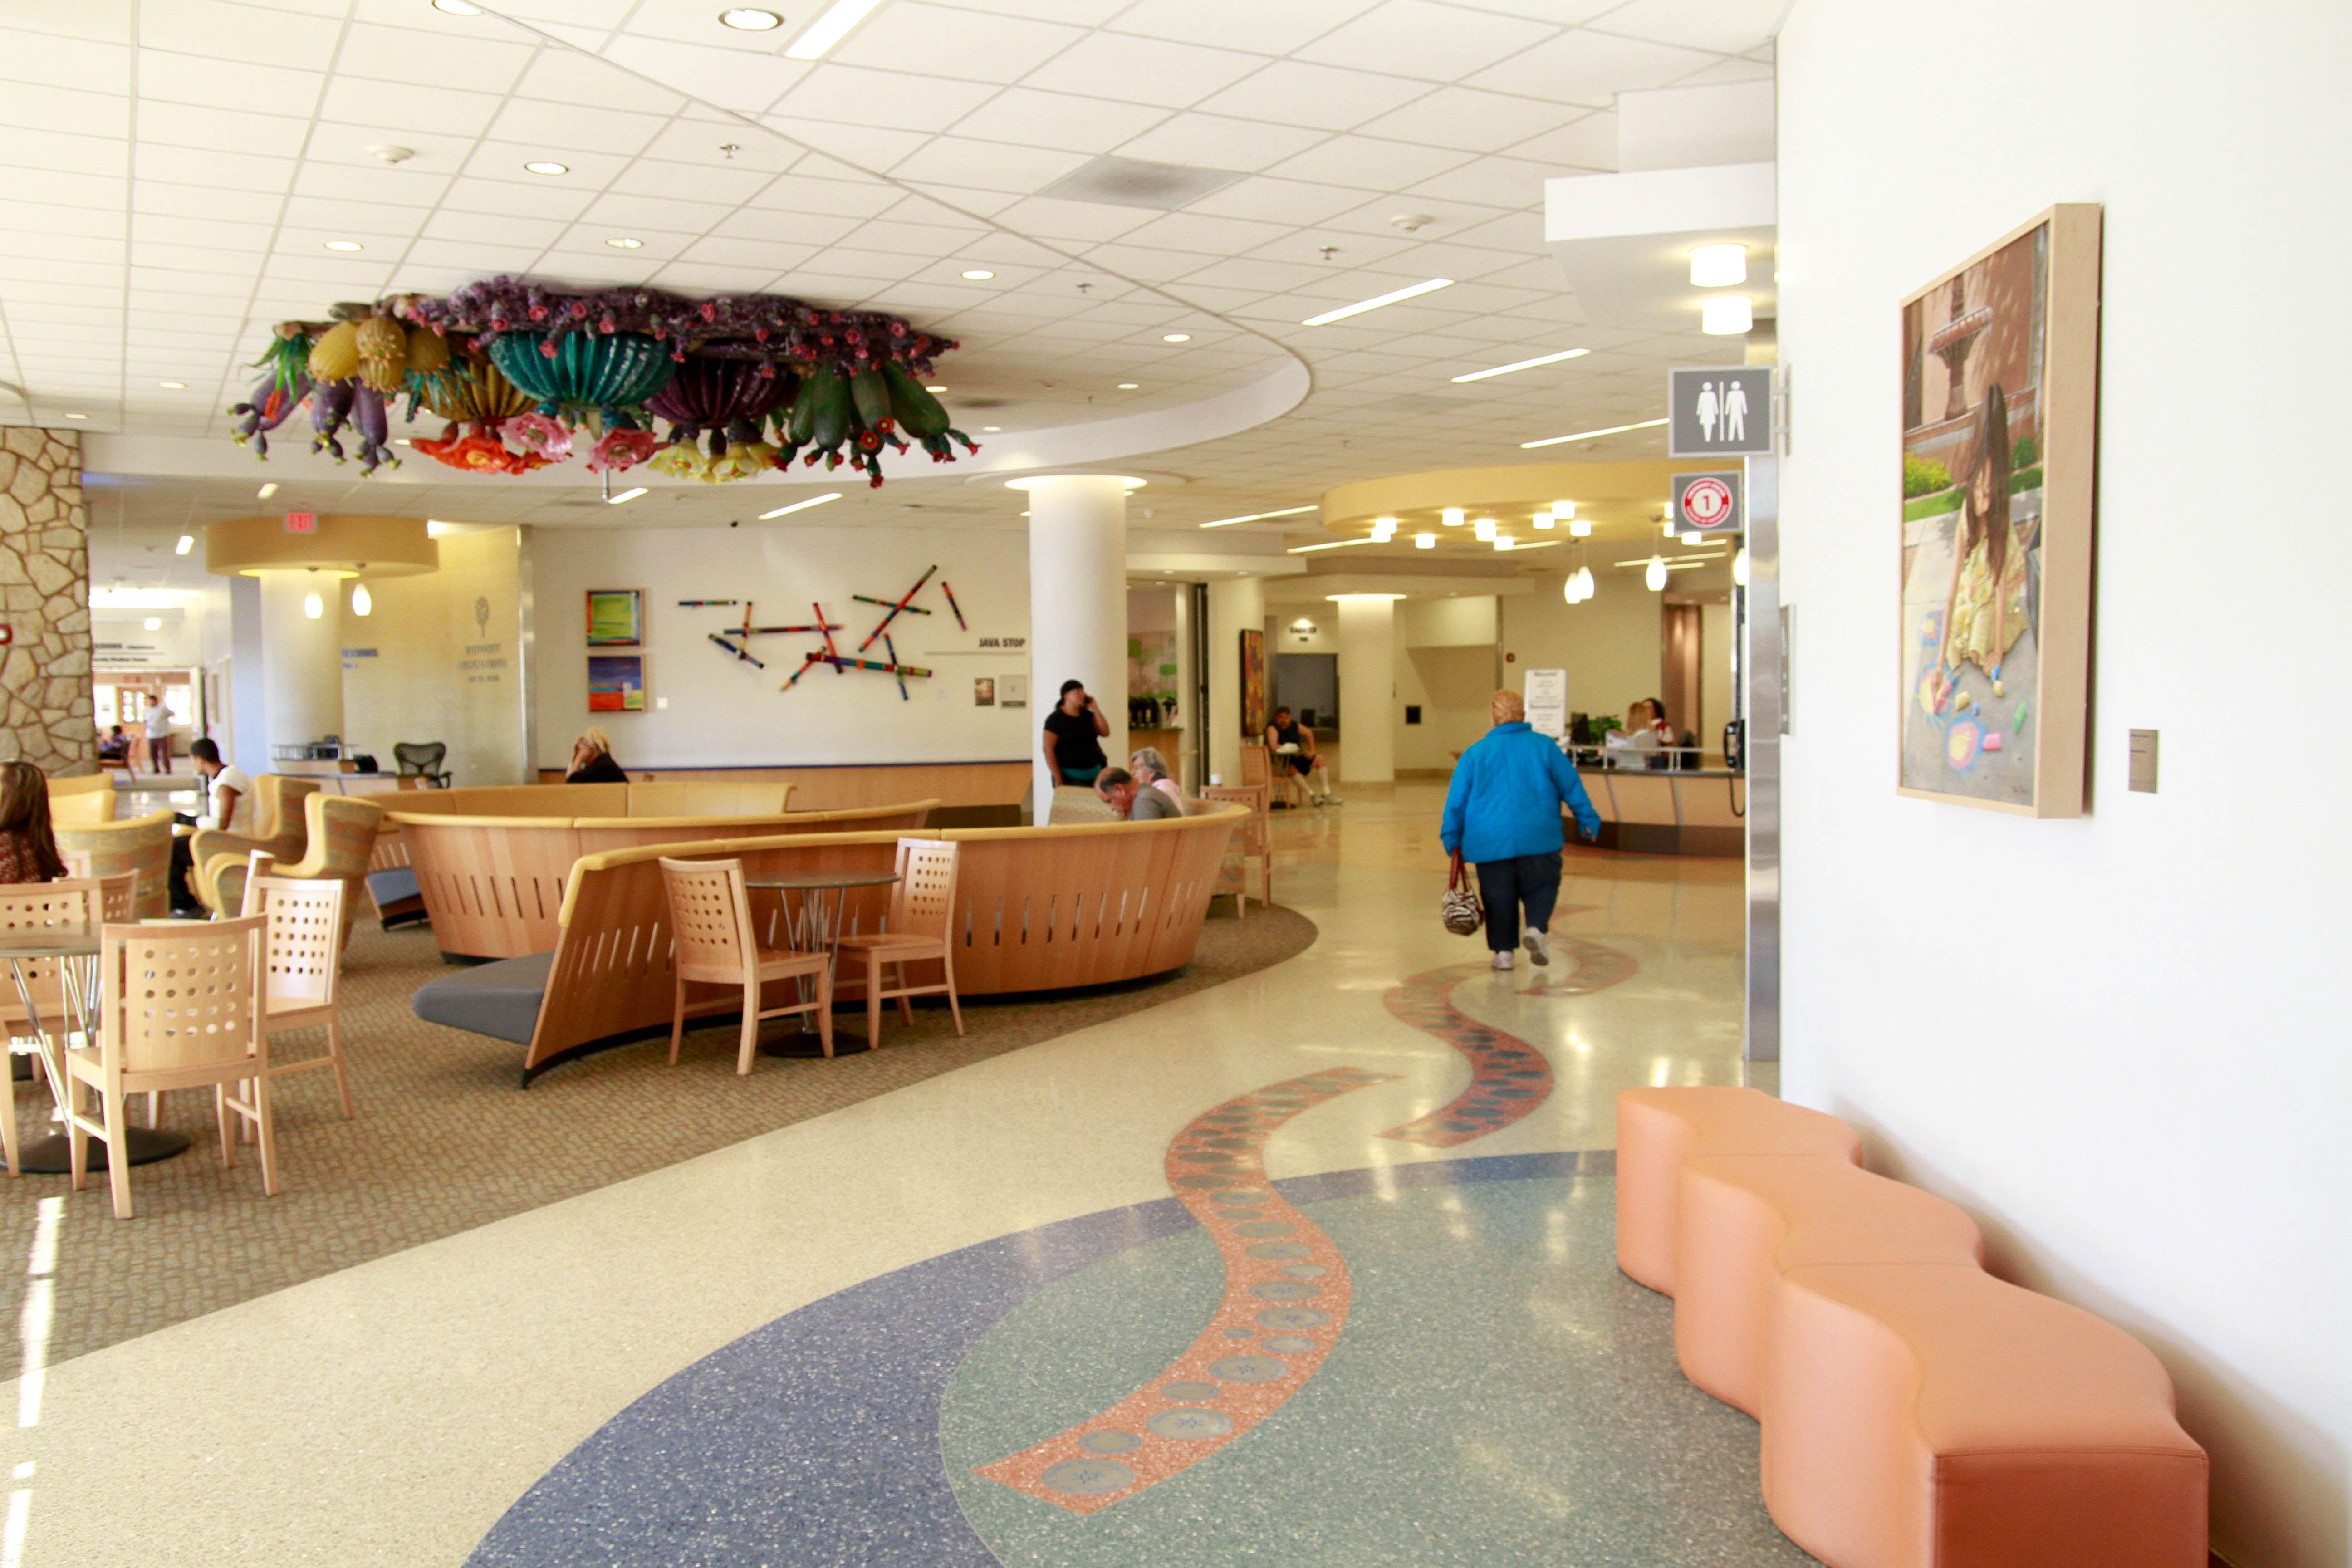 Art At El Paso Children S Hospital And University Medical Center